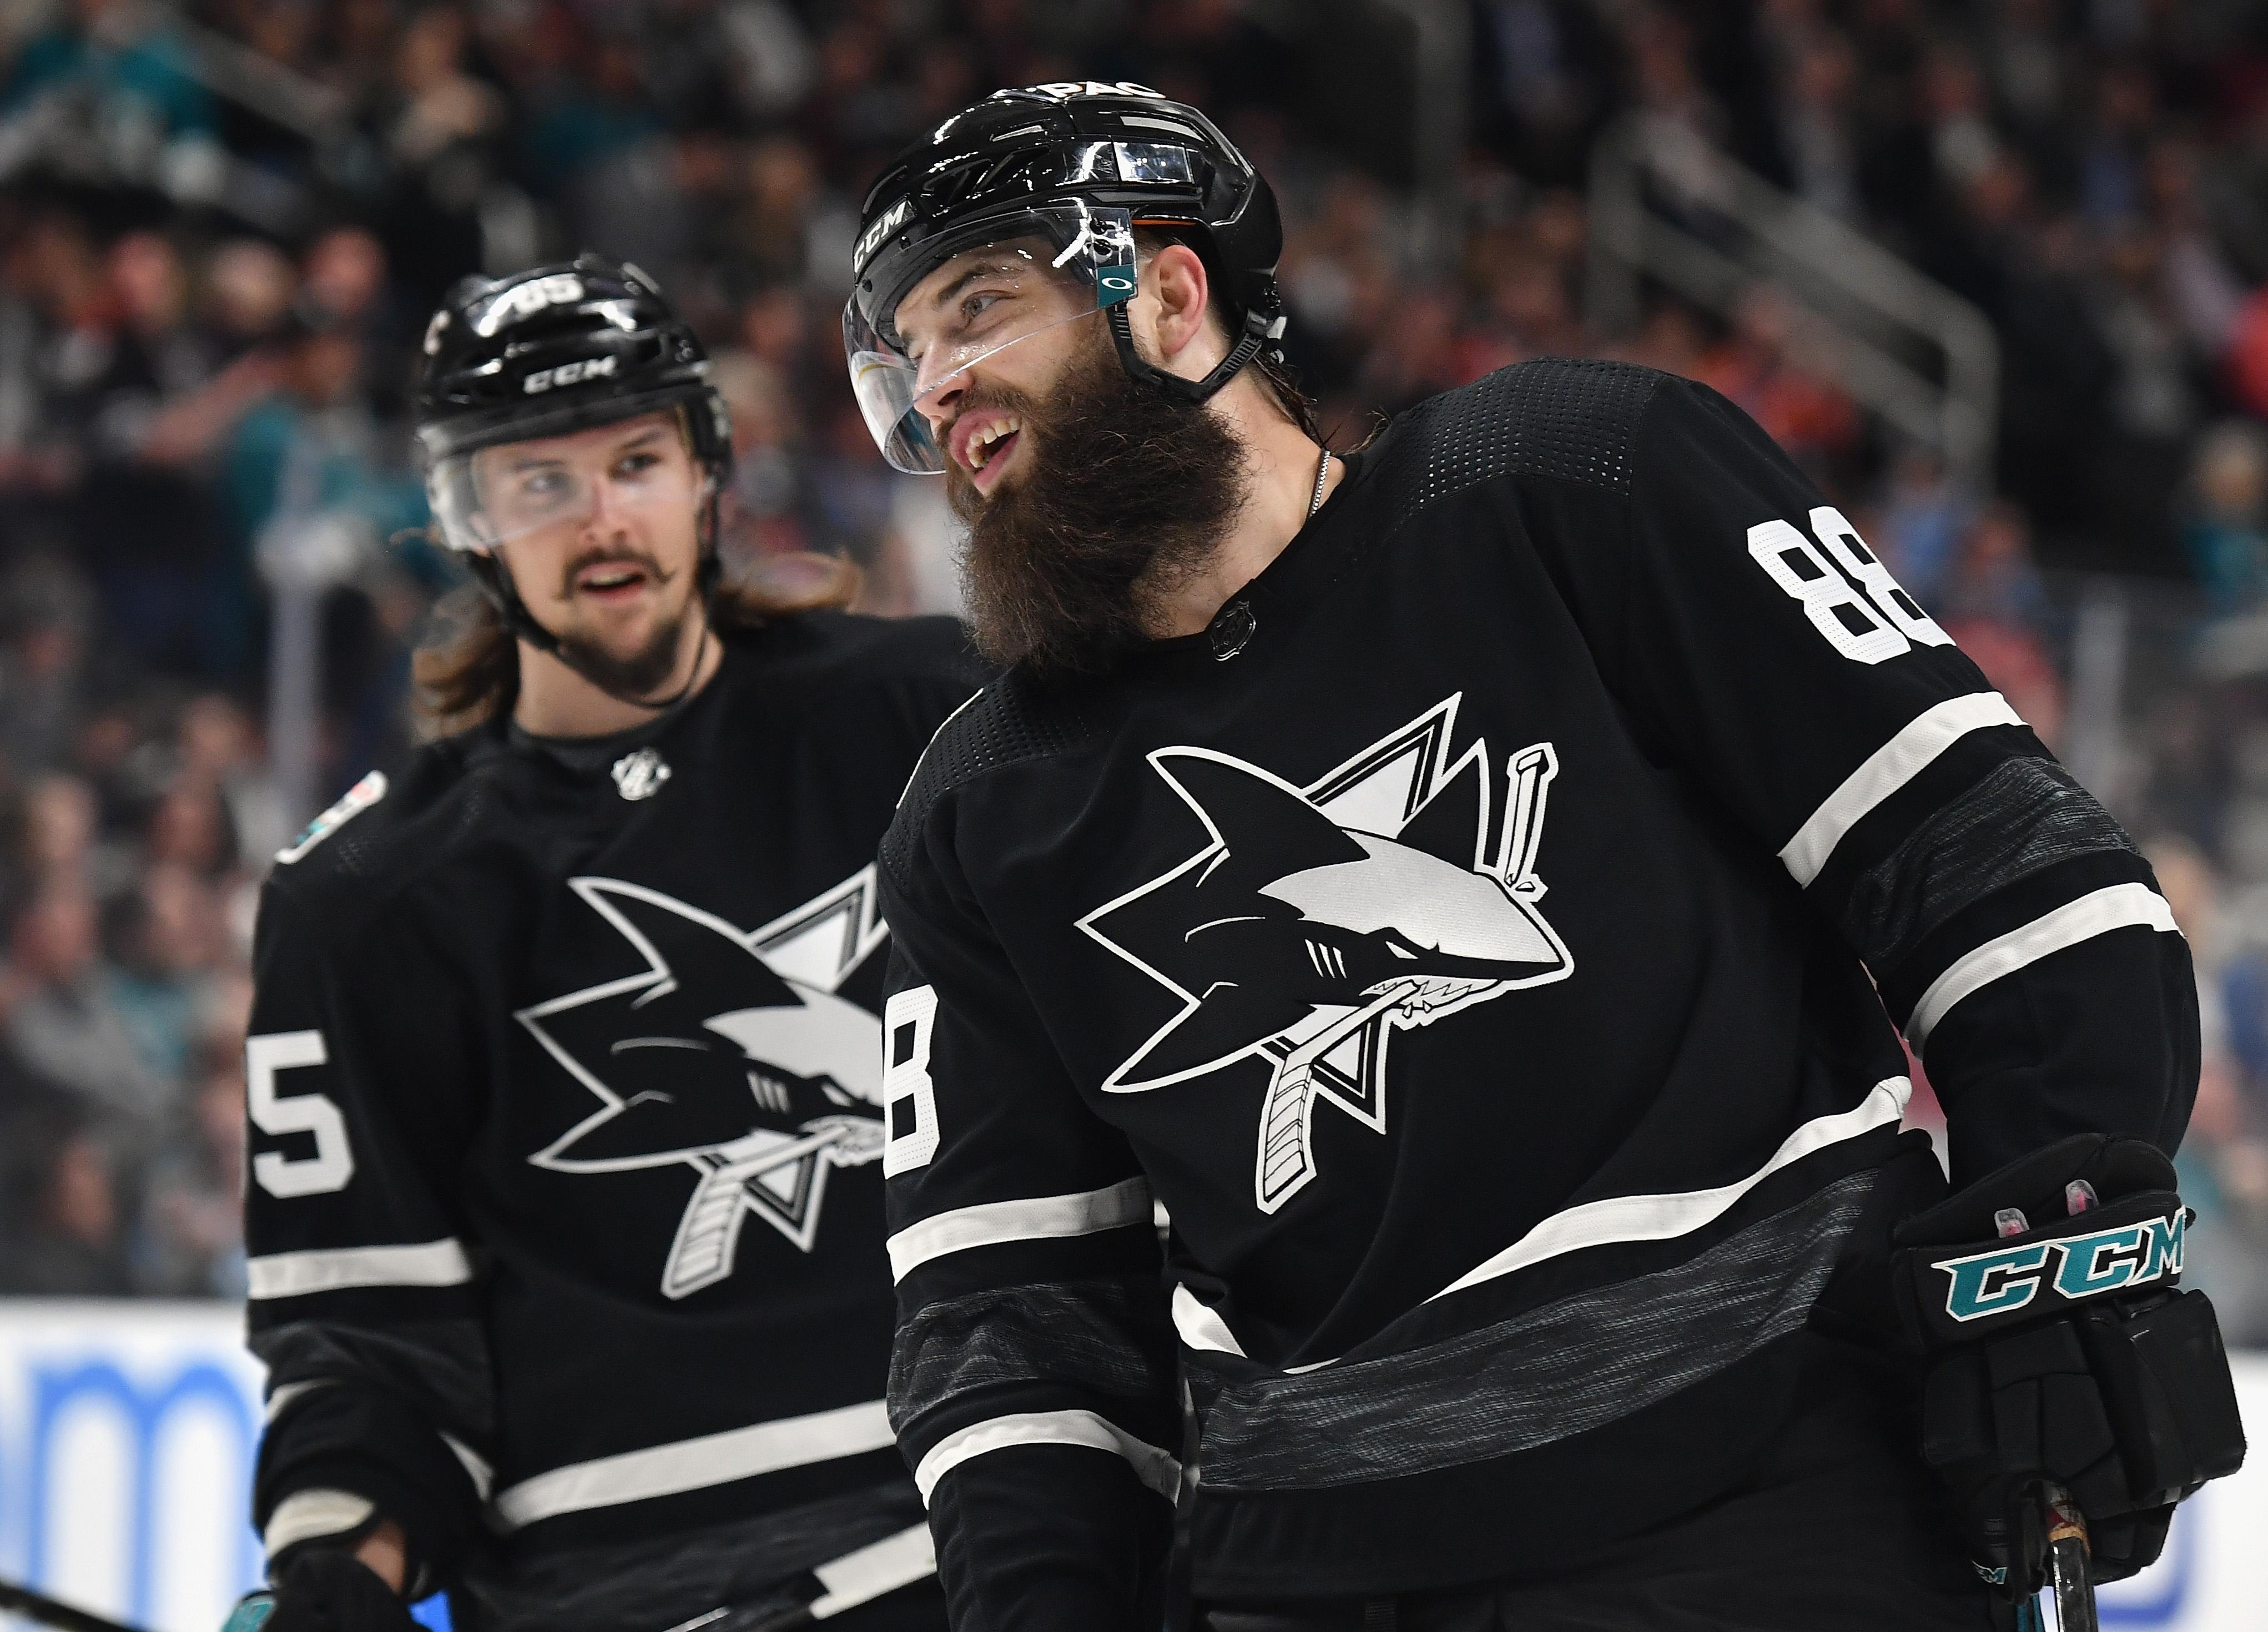 SAN JOSE, CA - JANUARY 26: Erik Karlsson #65 and Brent Burns #88 of the San Jose Sharks plays in the 2019 Honda NHL All-Star Game at SAP Center on January 26, 2019 in San Jose, California.